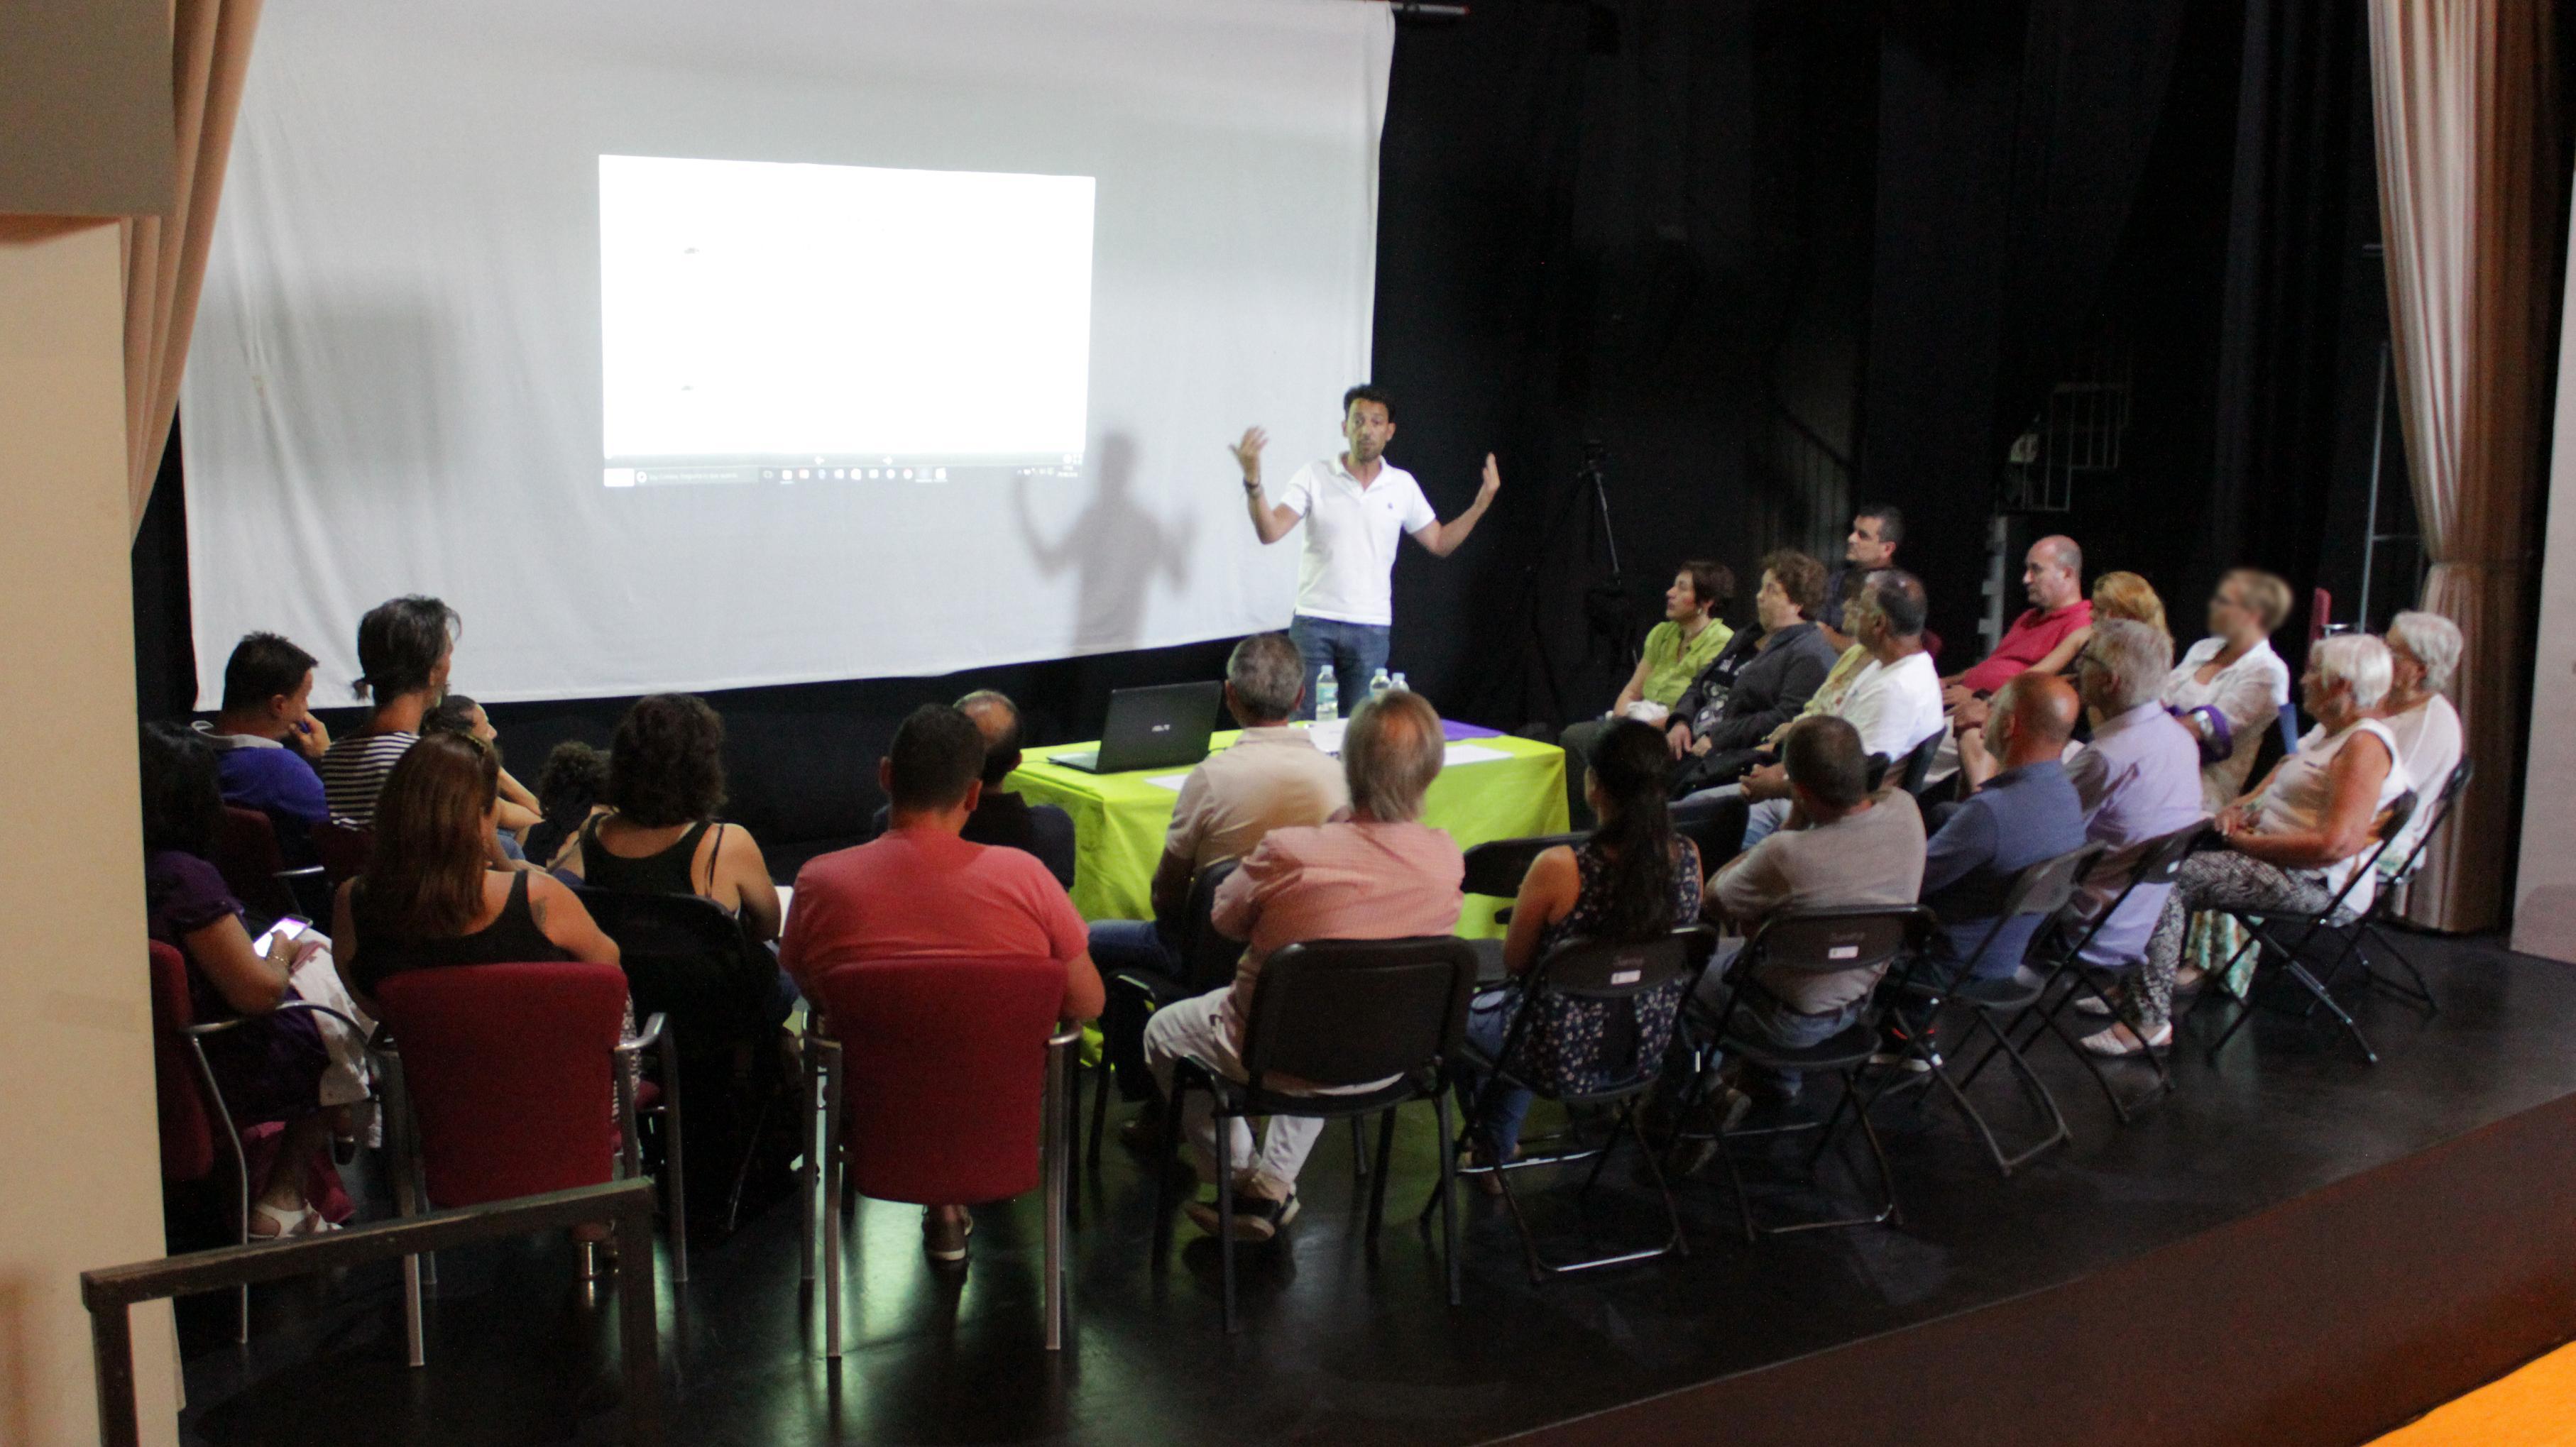 30-06-2016 Reunión vecinal Reglamento Participación Ciudadana (1)